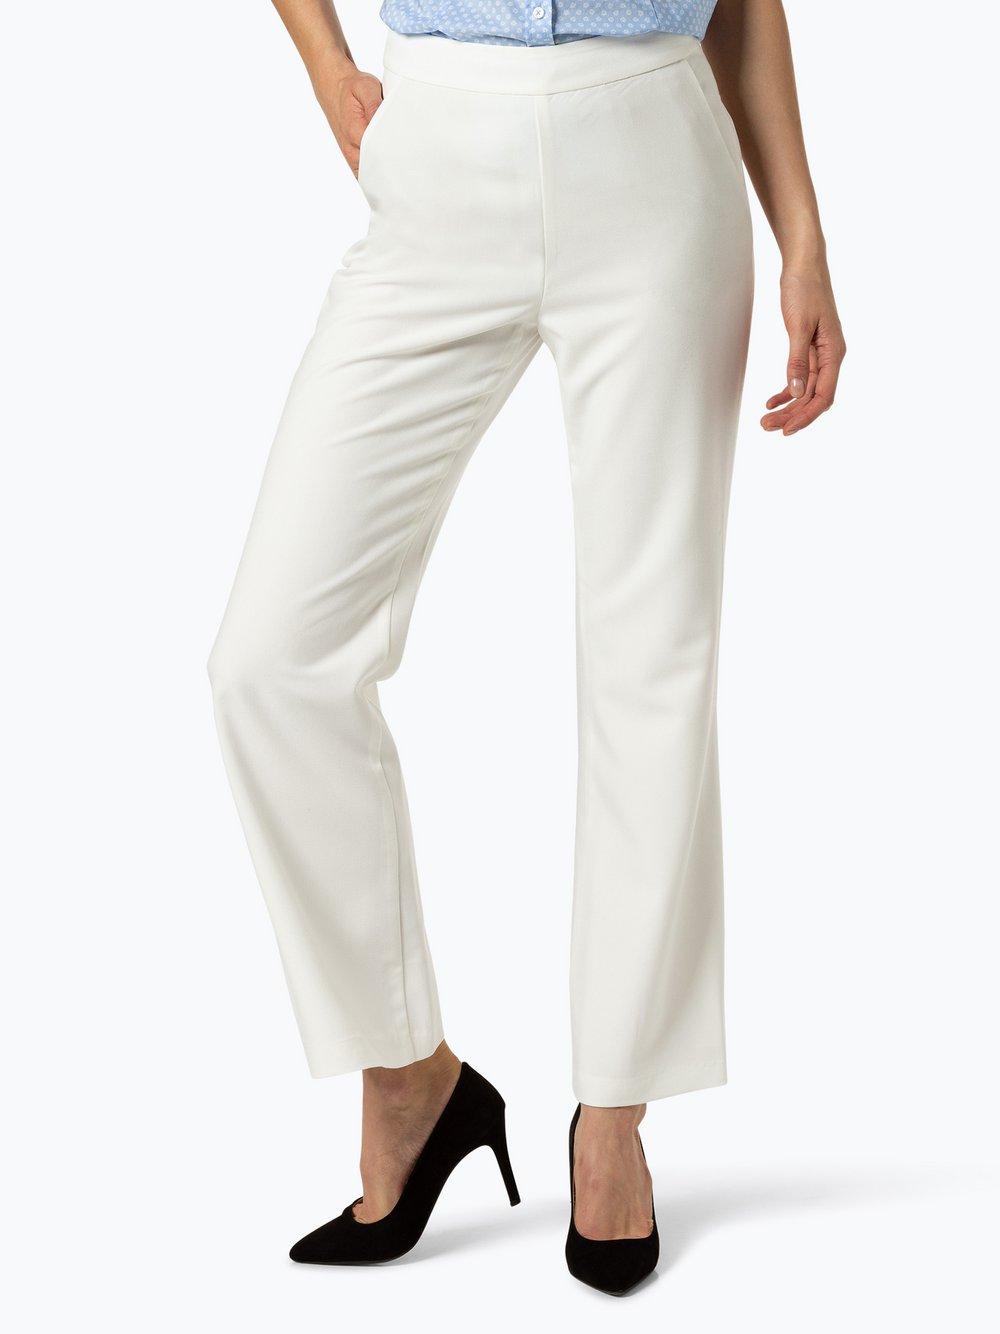 Esprit Collection – Spodnie damskie, beżowy Van Graaf 433762-0001-00400